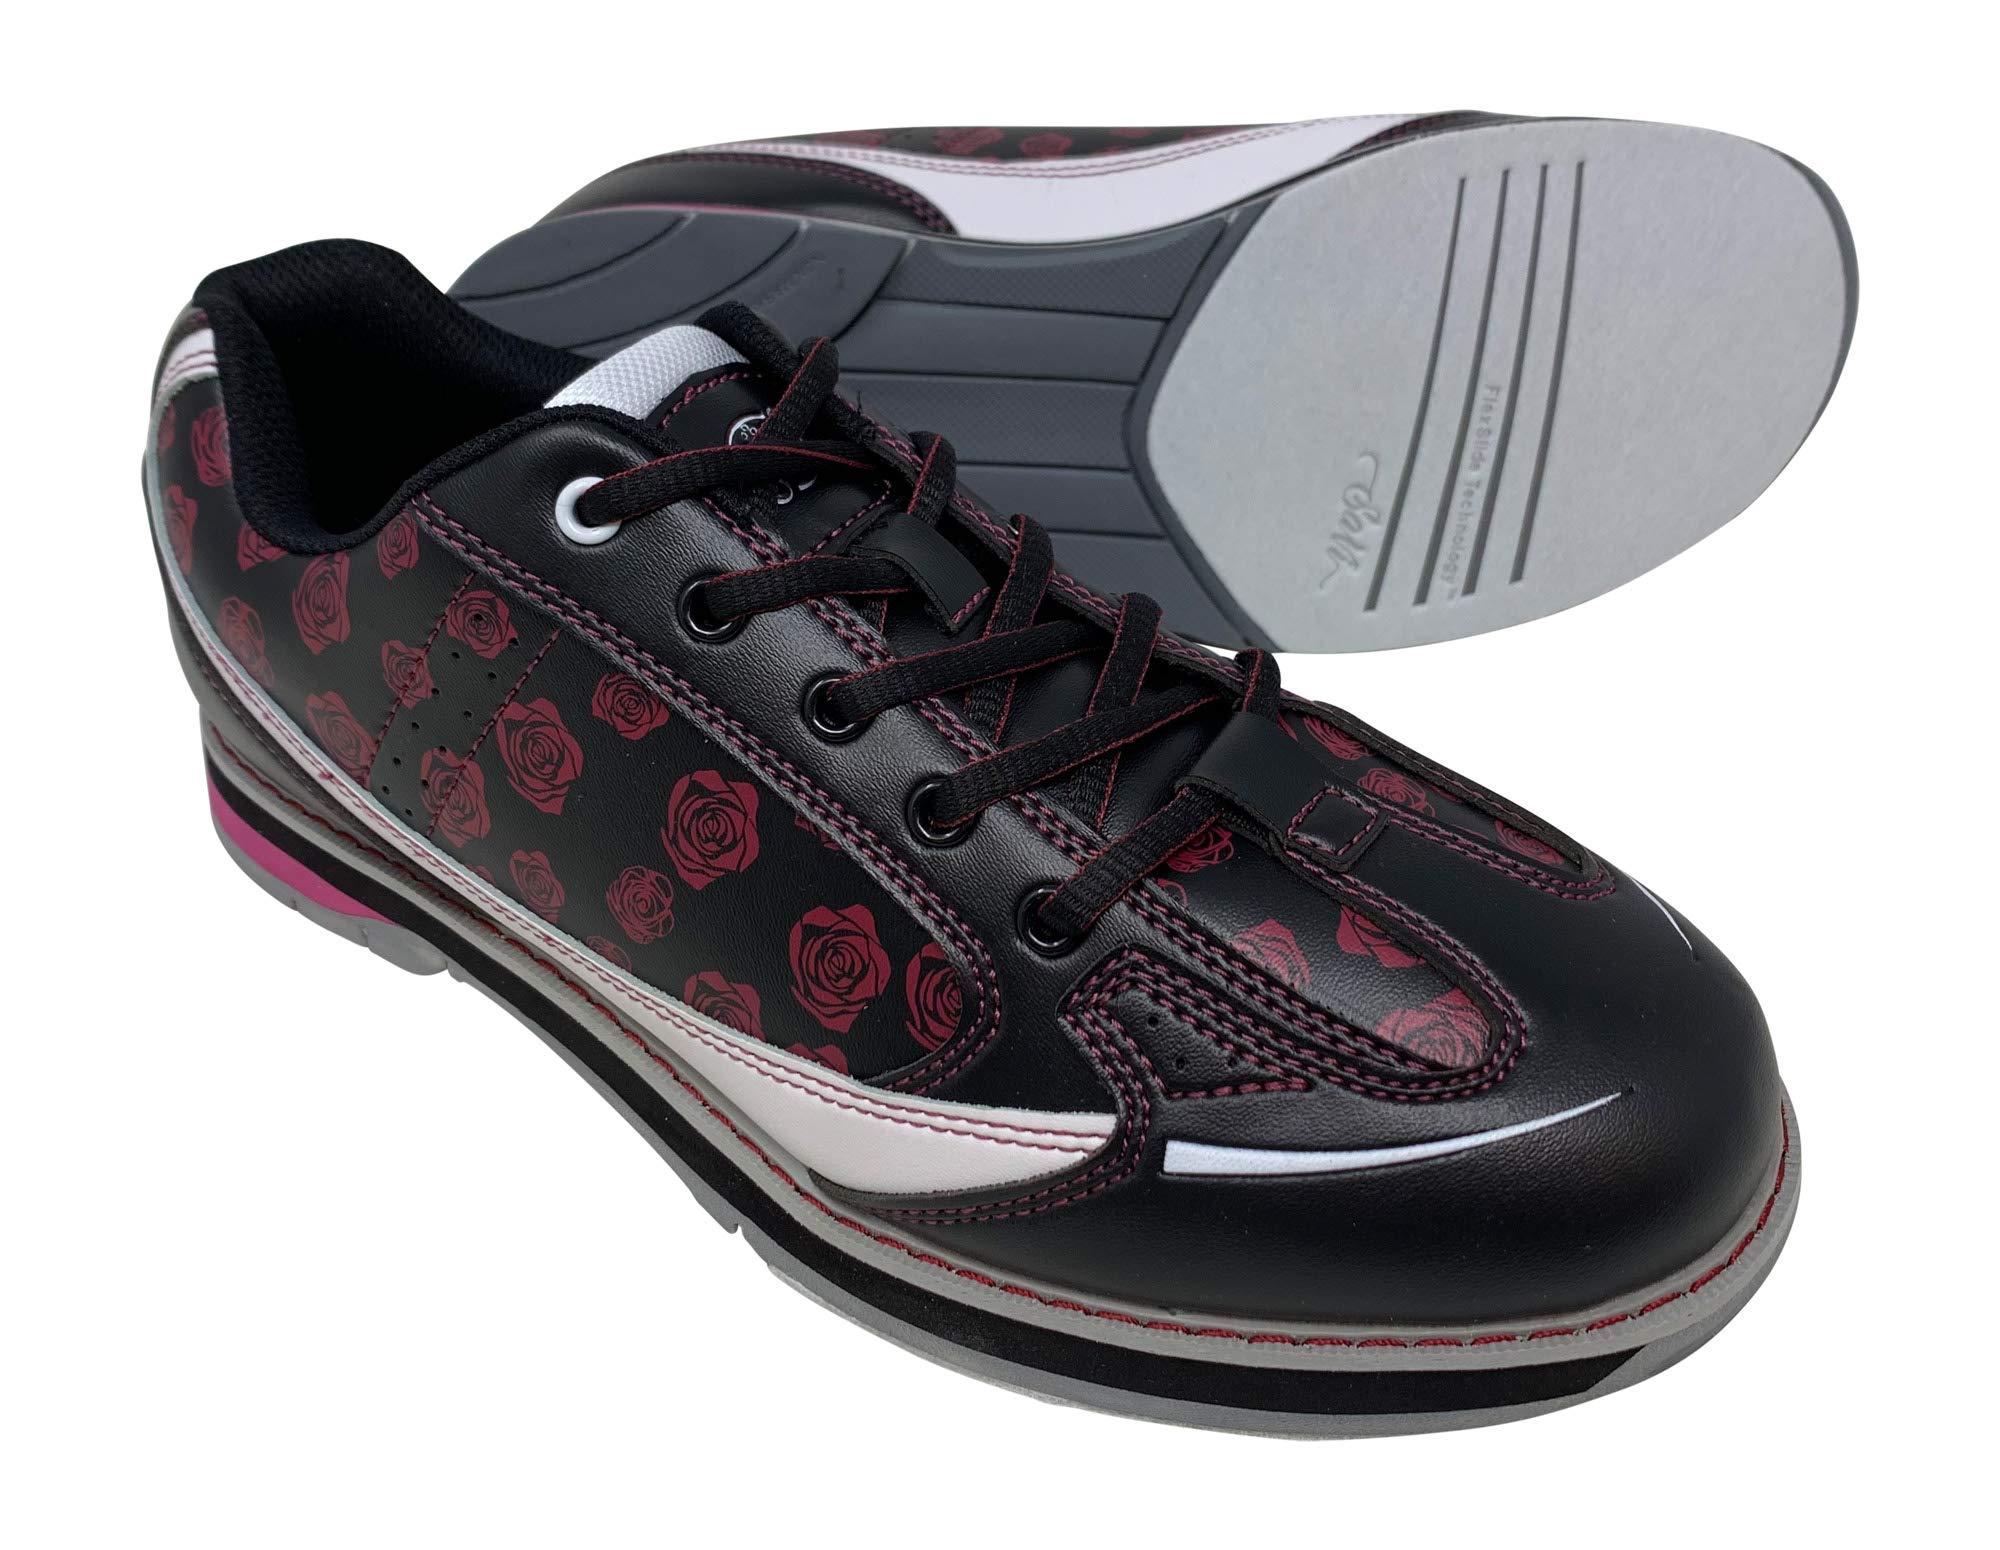 SaVi Bowling Women's Roses Black/Red/White Bowling Shoes (7.5) by SaVi Bowling Products